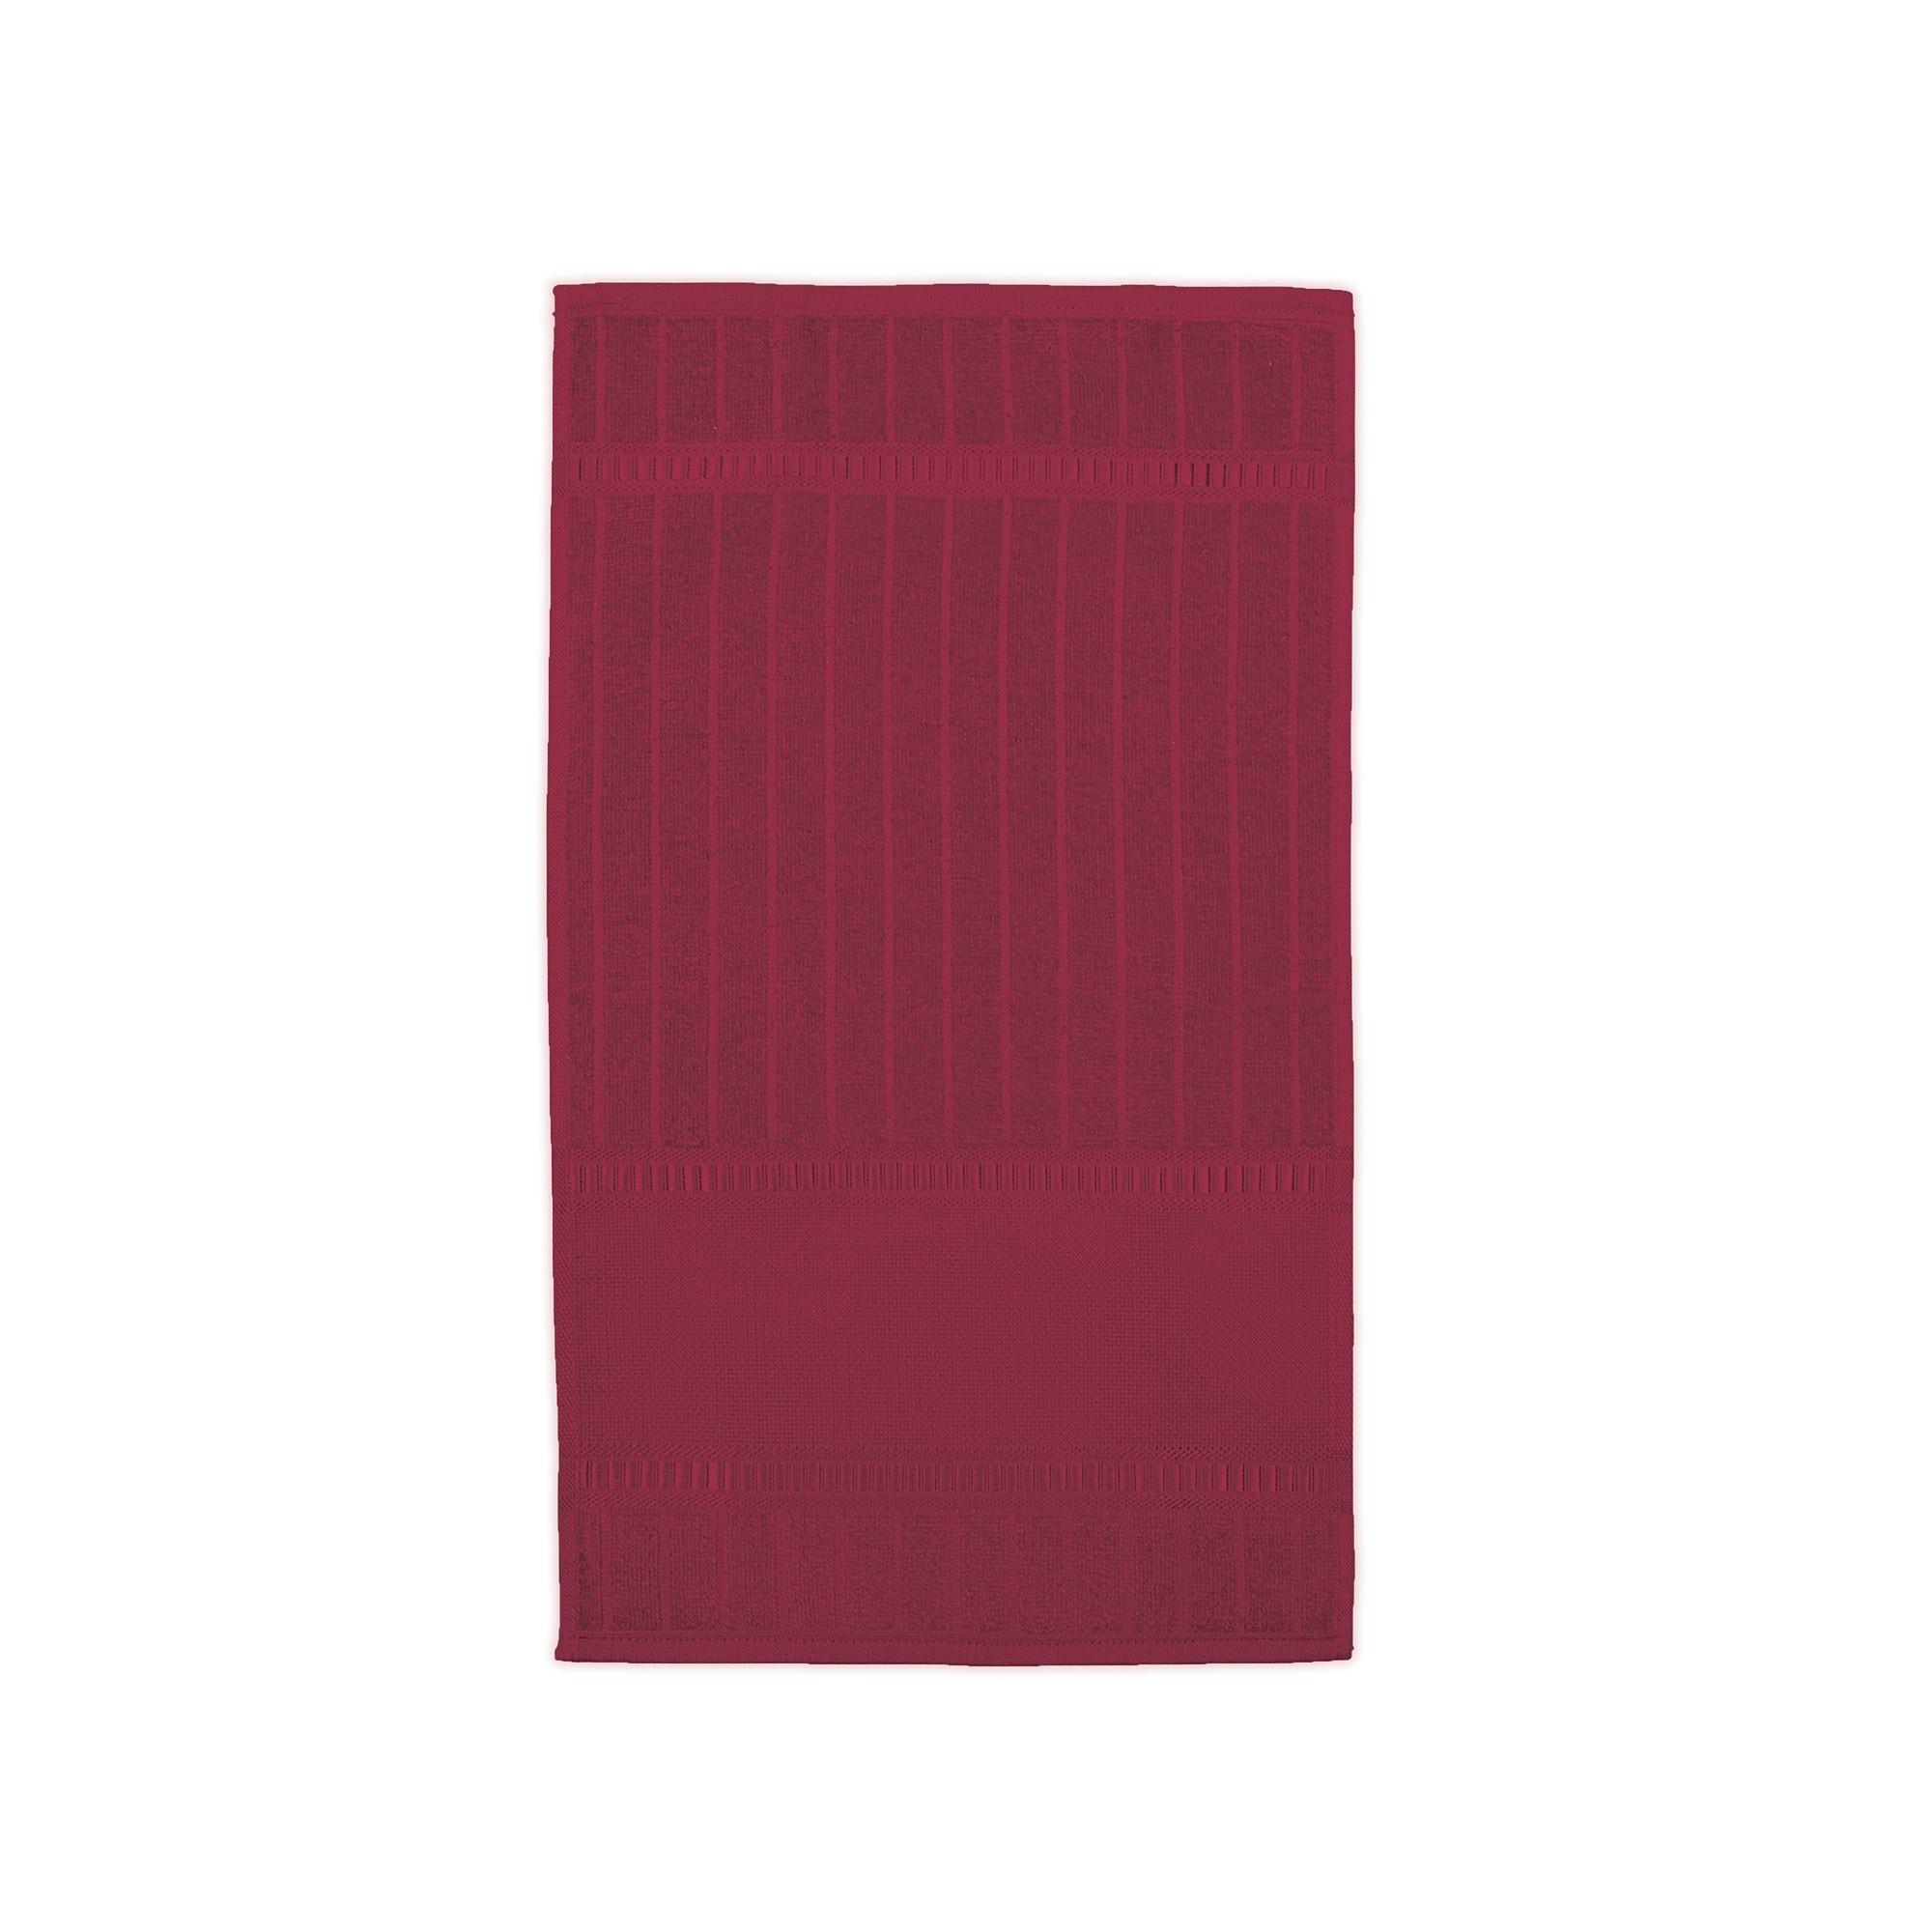 Toalha Lavabo Carprice Luxo 100 Algodao 30x50 cm Vermelha - Buettner